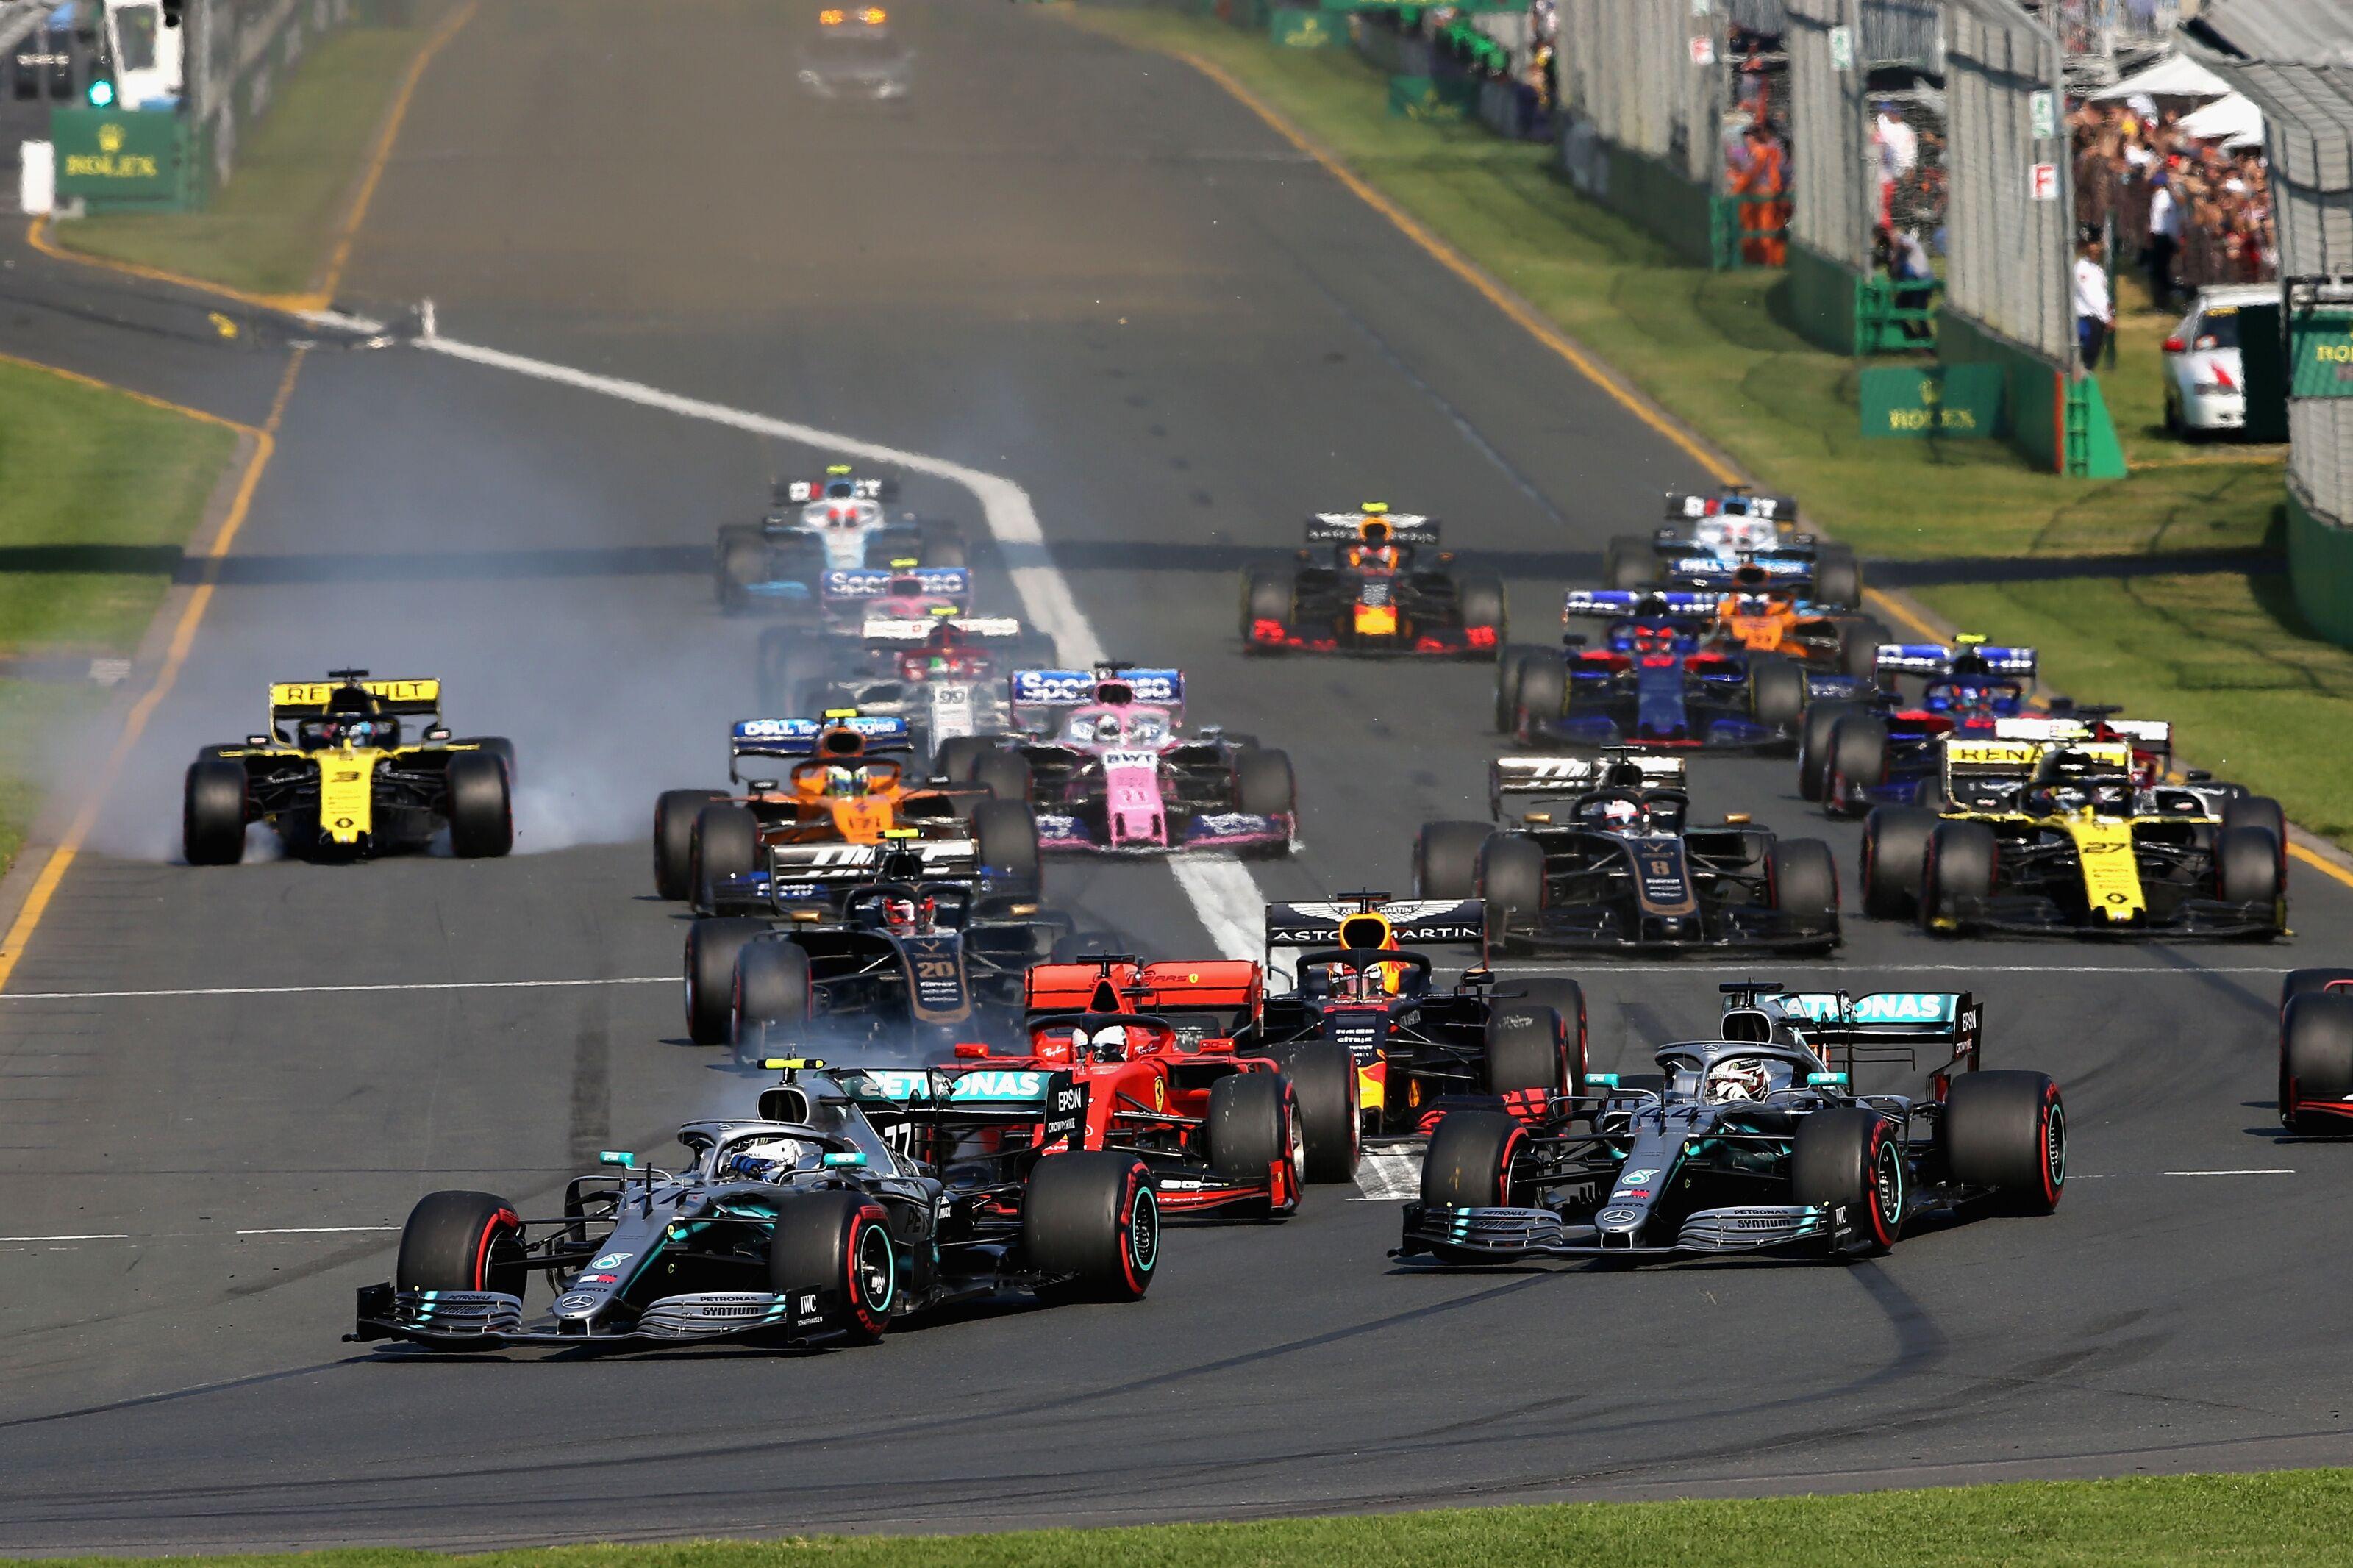 Formula 1 Team Power Rankings after 2019 Australian Grand Prix